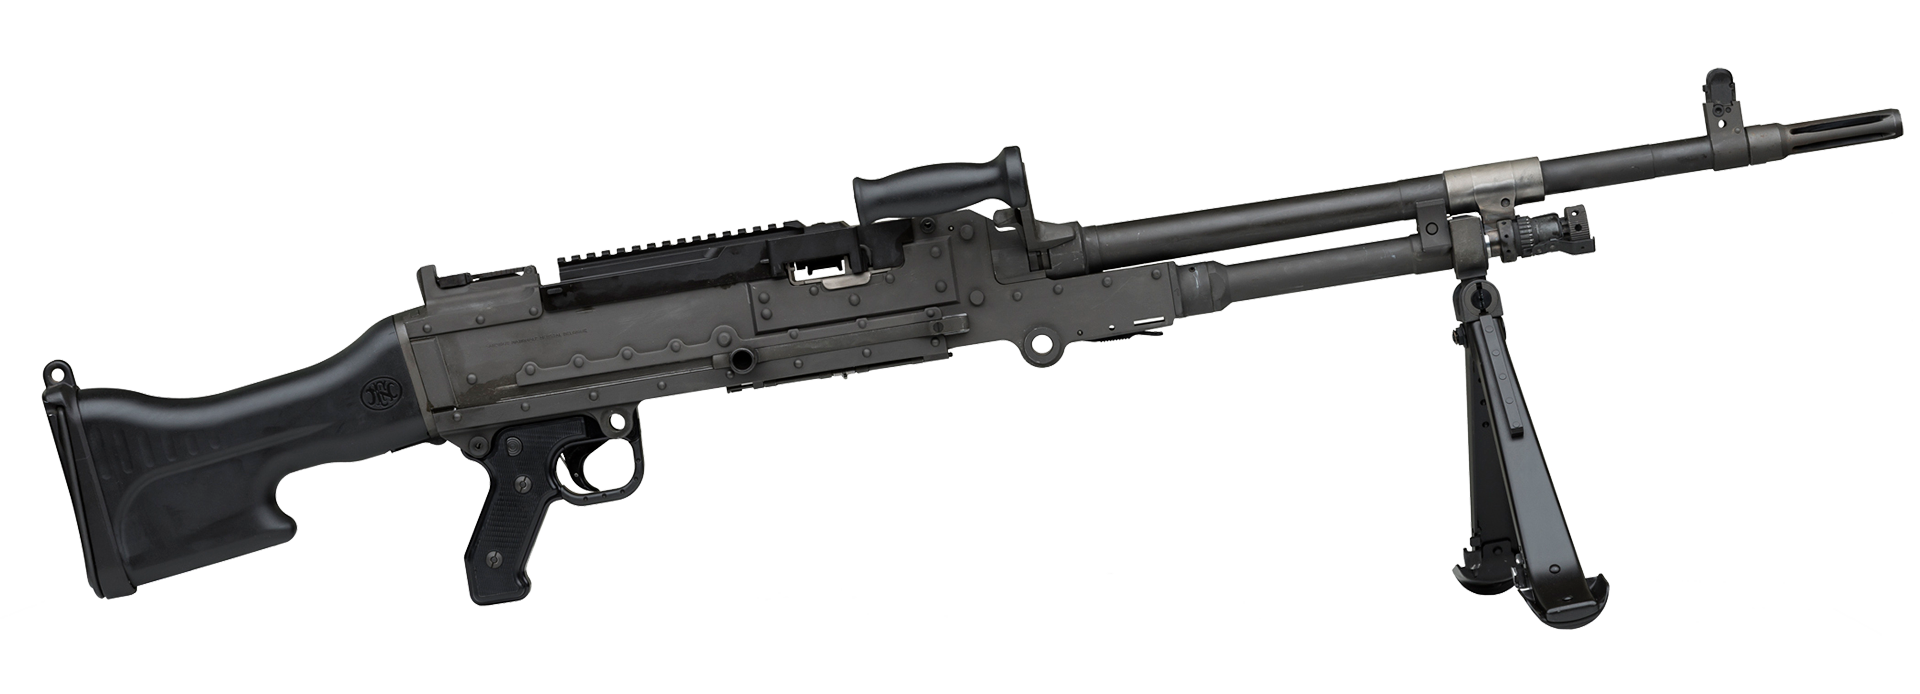 FN MAG®